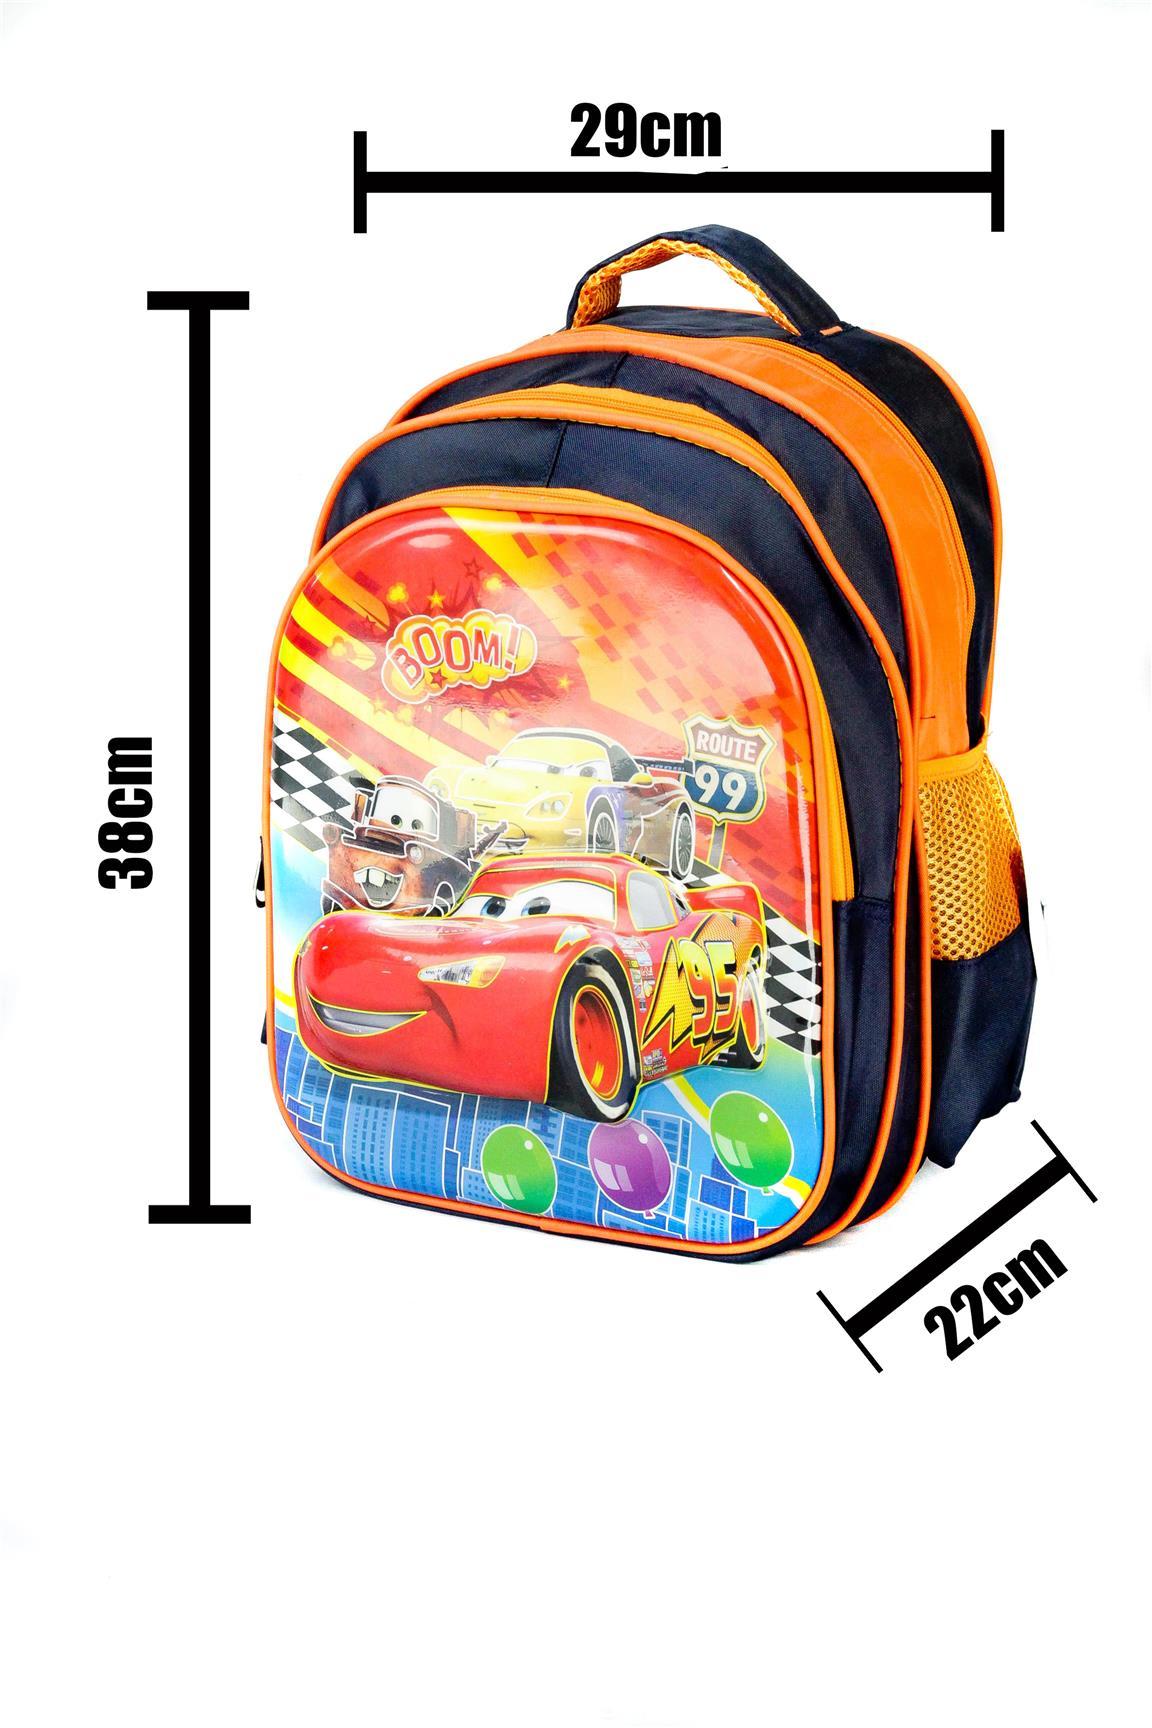 Uncategorized Disney Cars Pictures To Print schoolbagsekolah3dprintdisney end 11292018 1015 pm schoolbagsekolah3dprintdisneycarscar